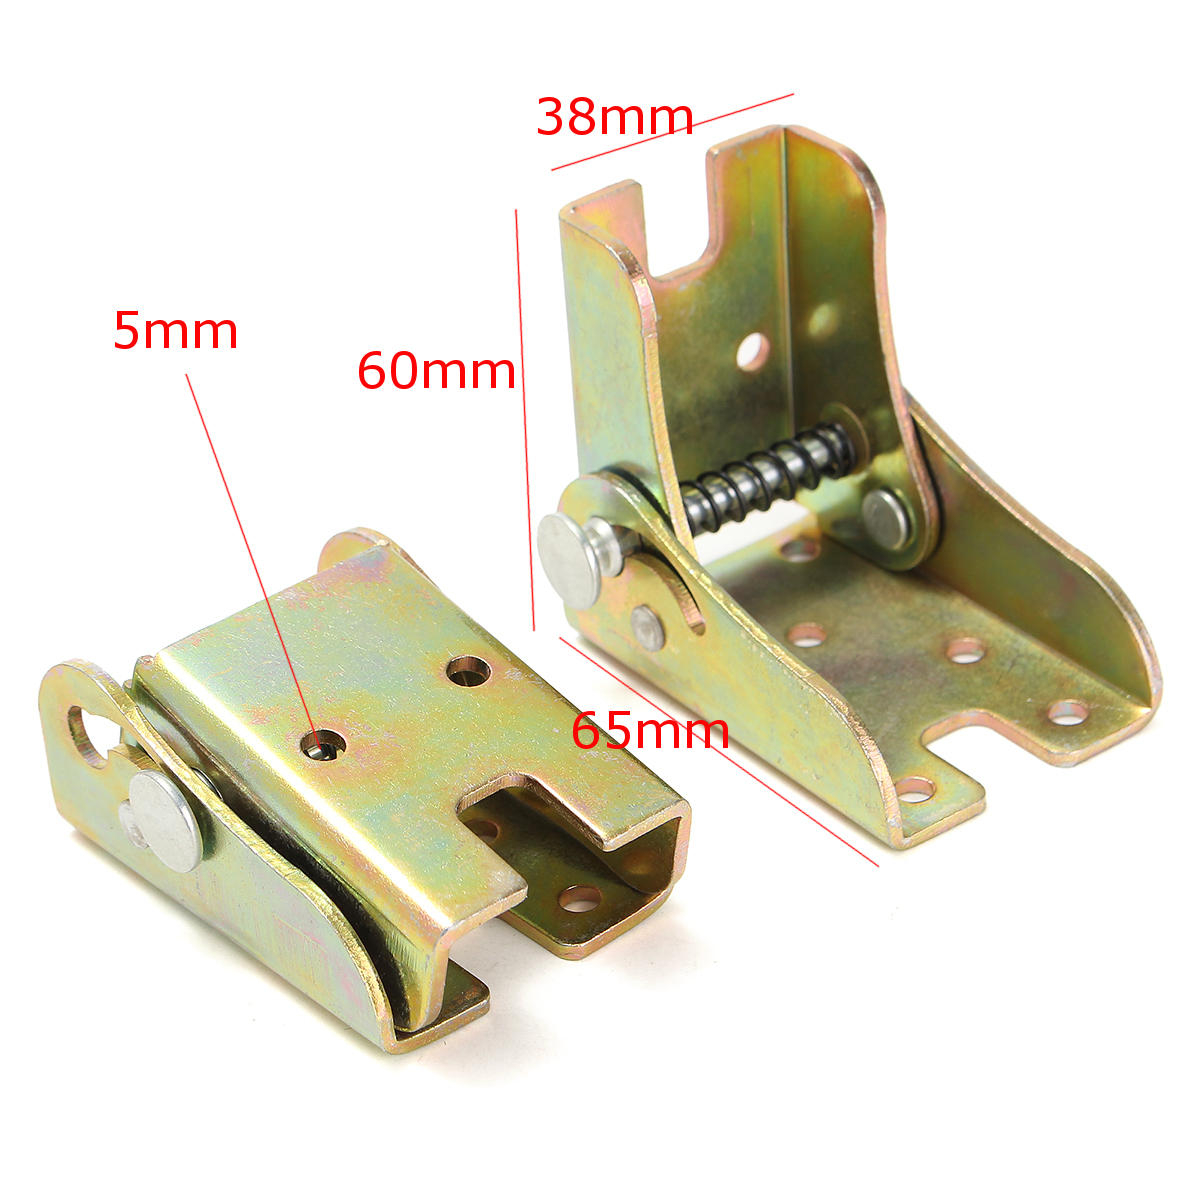 2pcs Folding Feet Hinges Self Lock Zinc Alloy For Table Leg Bracket regarding sizing 1200 X 1200